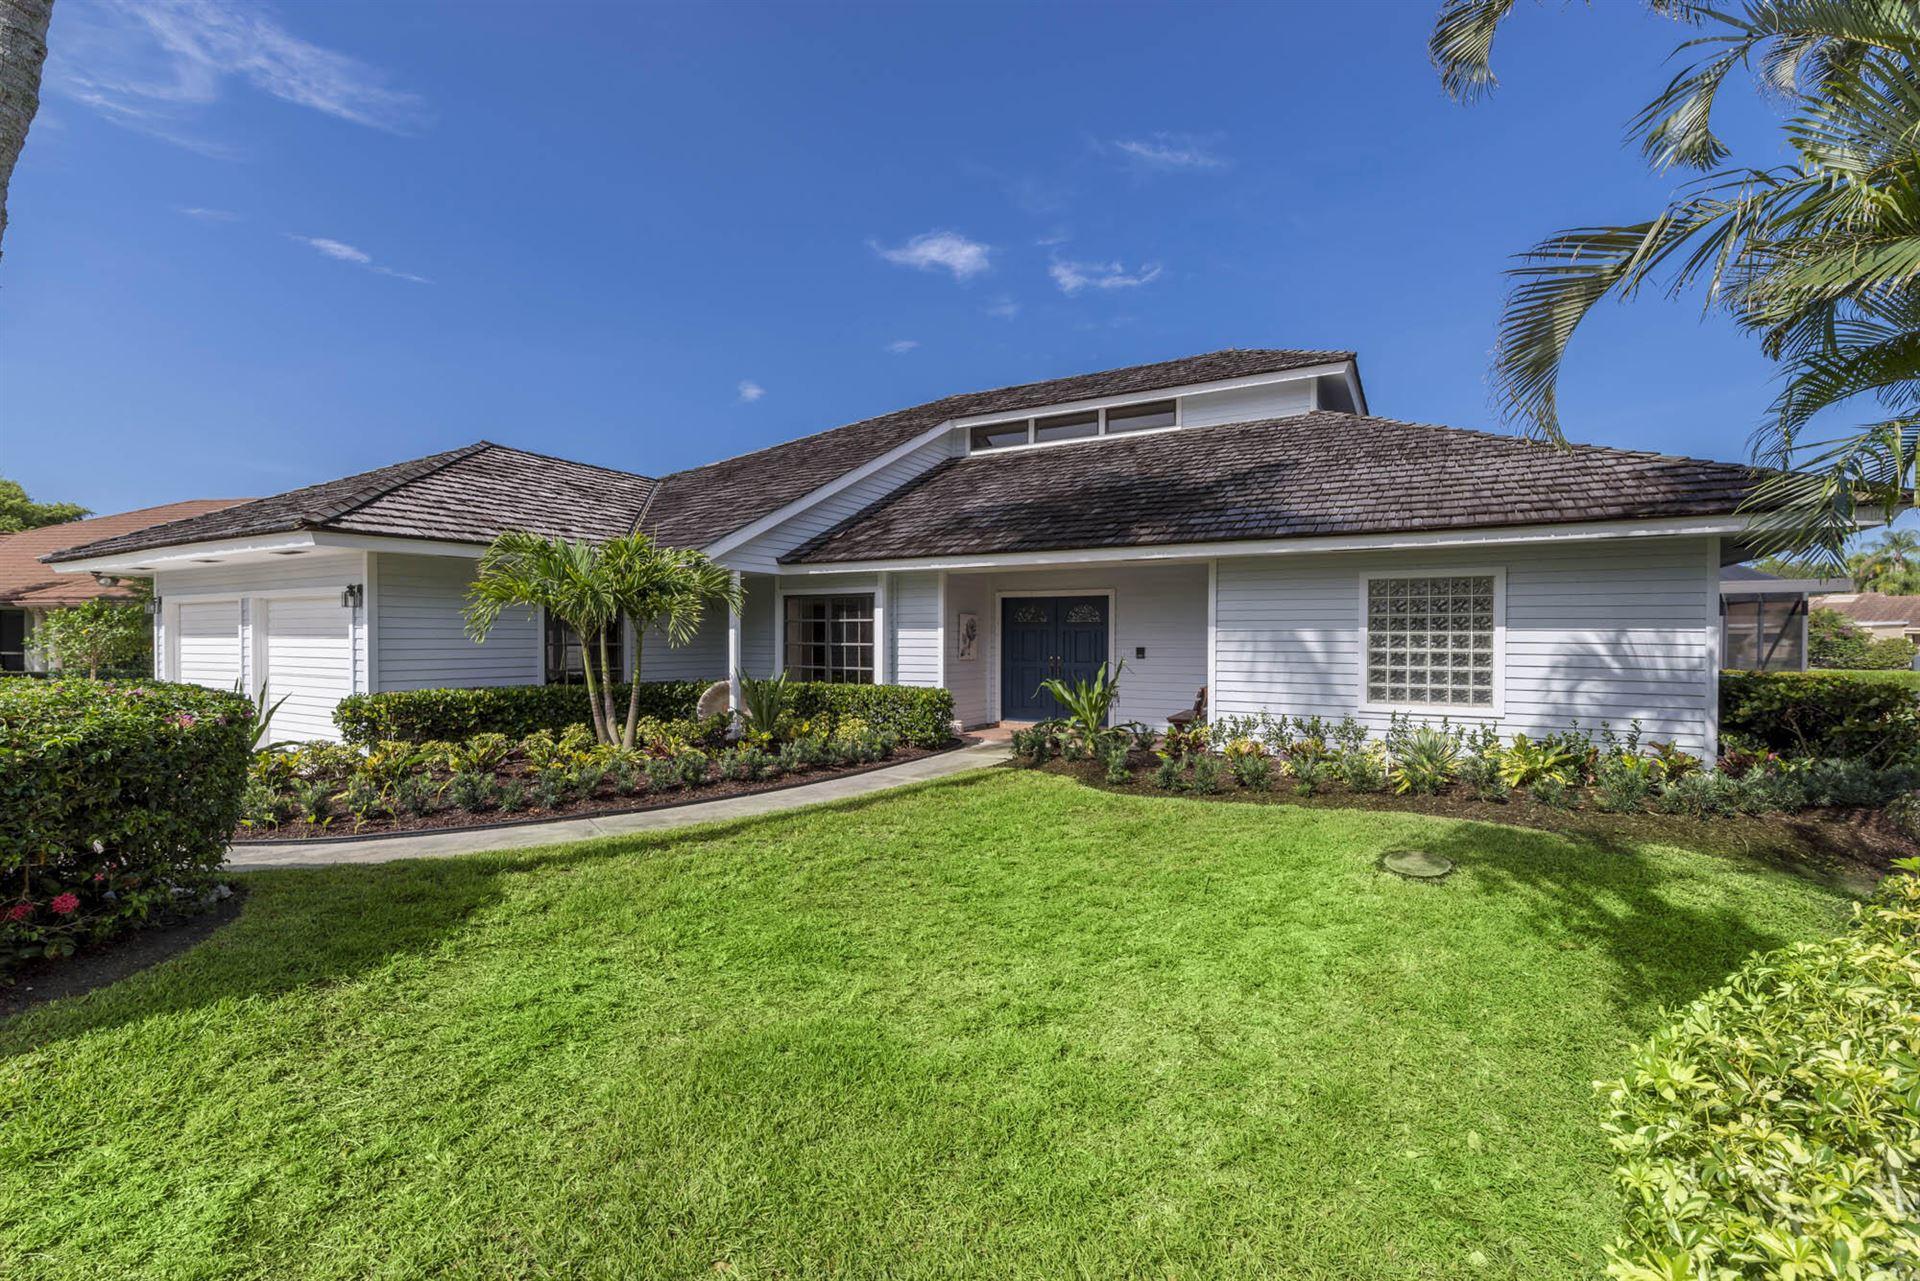 Photo of 6 Alford Court, Palm Beach Gardens, FL 33418 (MLS # RX-10734192)